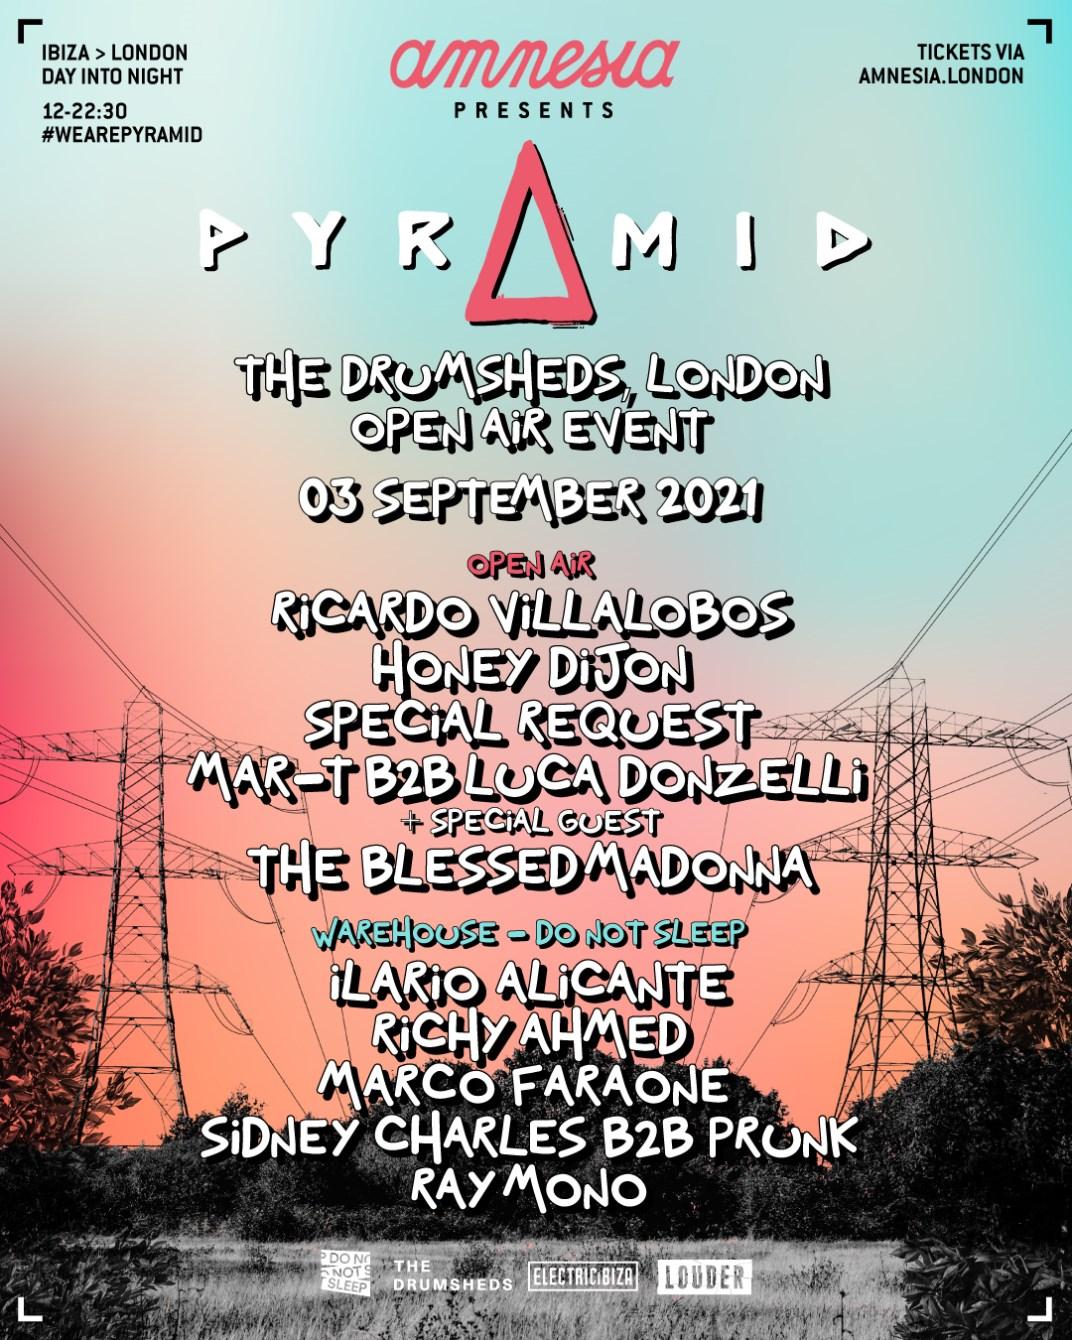 [CANCELLED] Amnesia presents Pyramid, The Drumsheds London - Ricardo Villalobos, Honey Dijon  - Flyer front